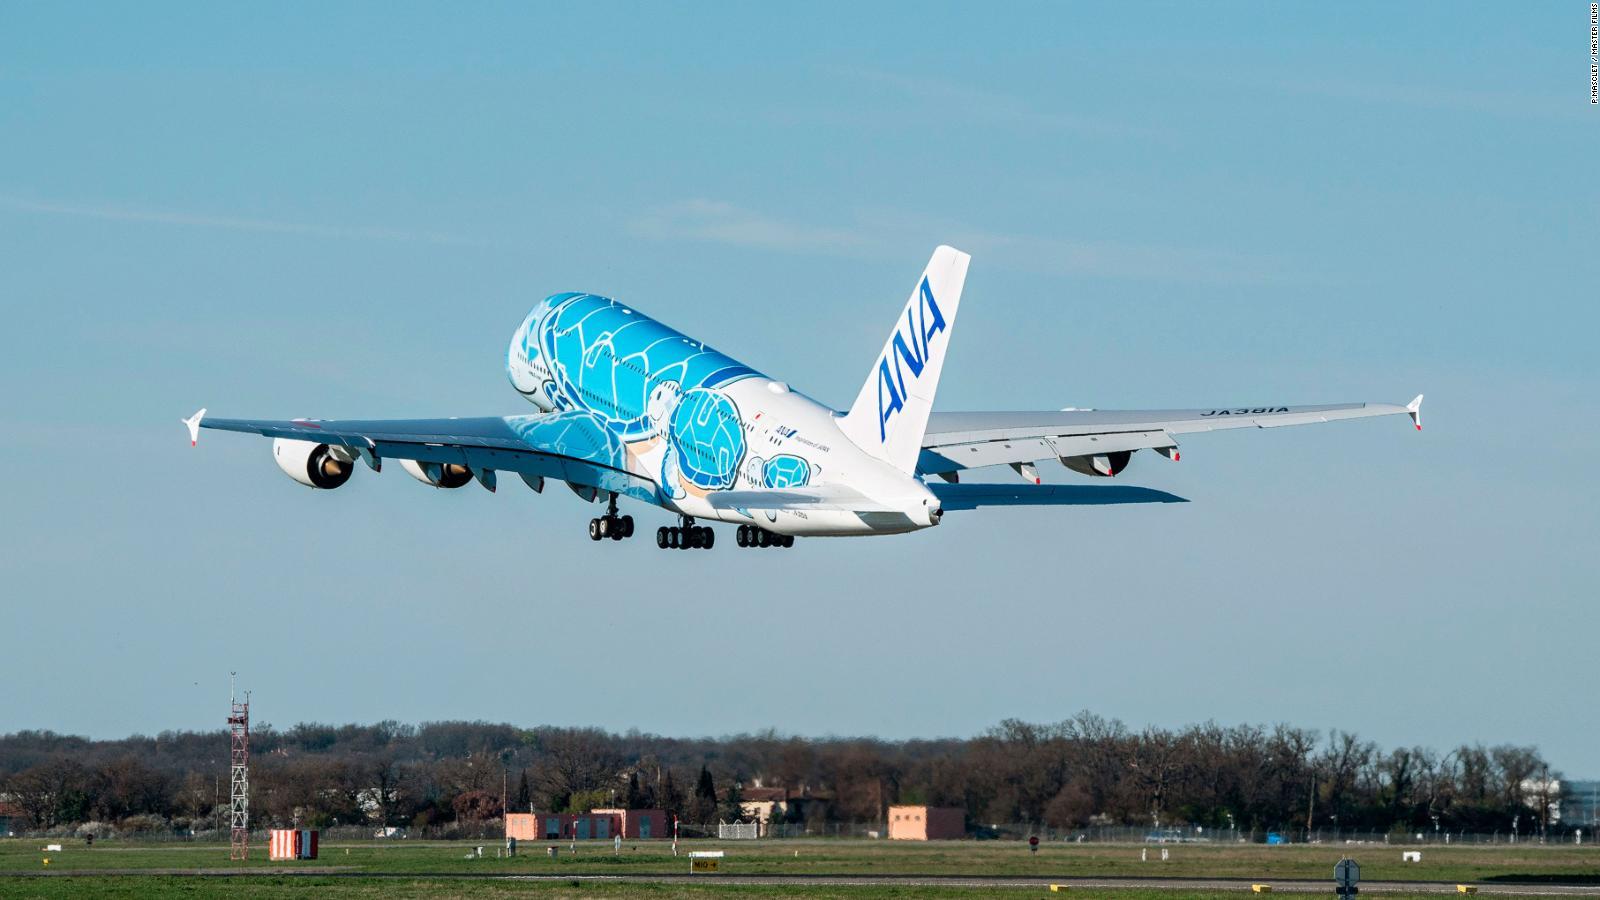 Flying turtle' A380 ready for takeoff | CNN Travel